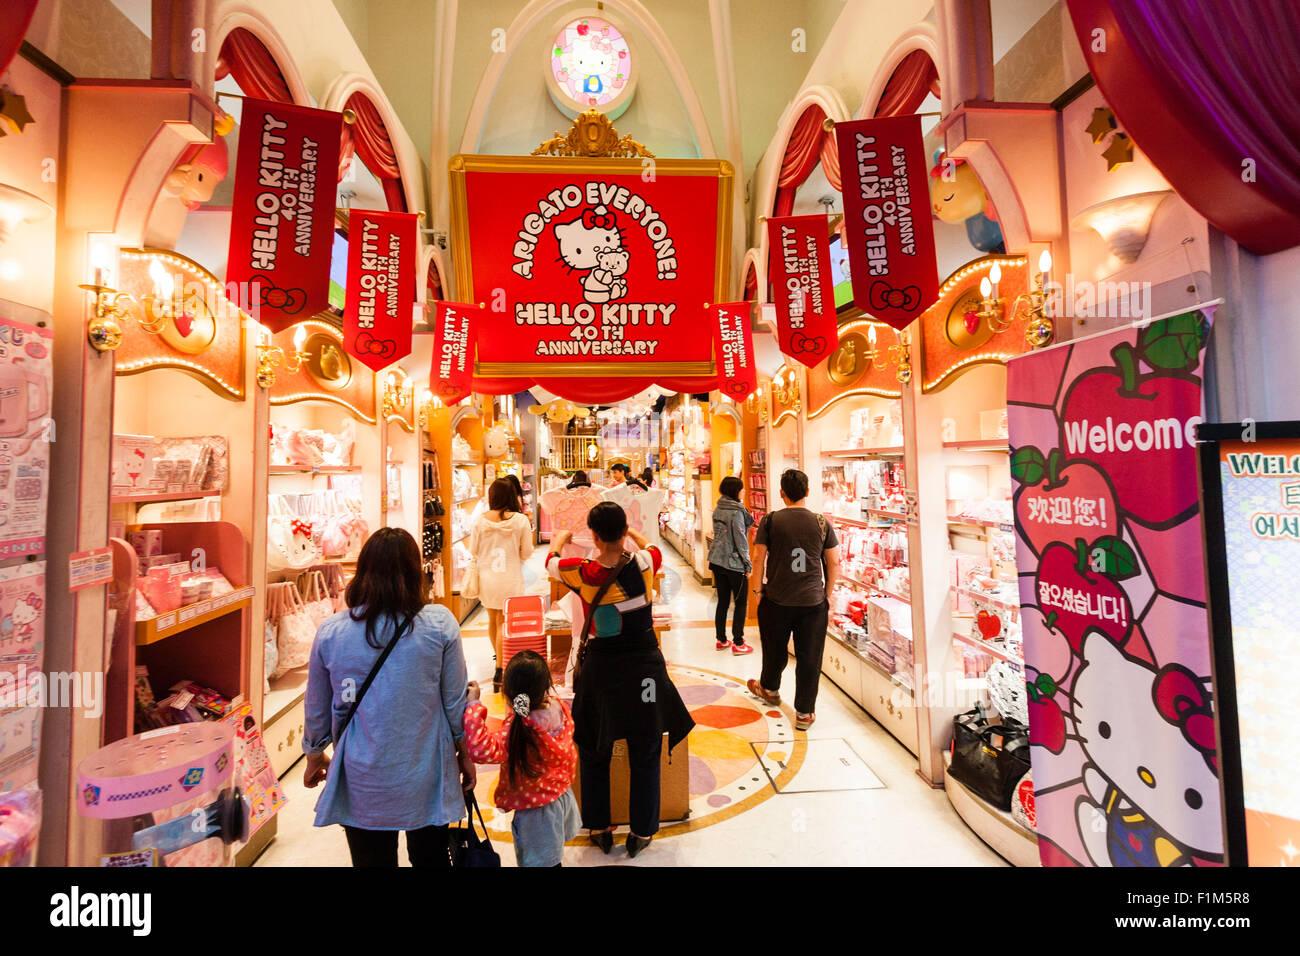 221241c65 Hello Kitty Shop Stock Photos & Hello Kitty Shop Stock Images - Alamy